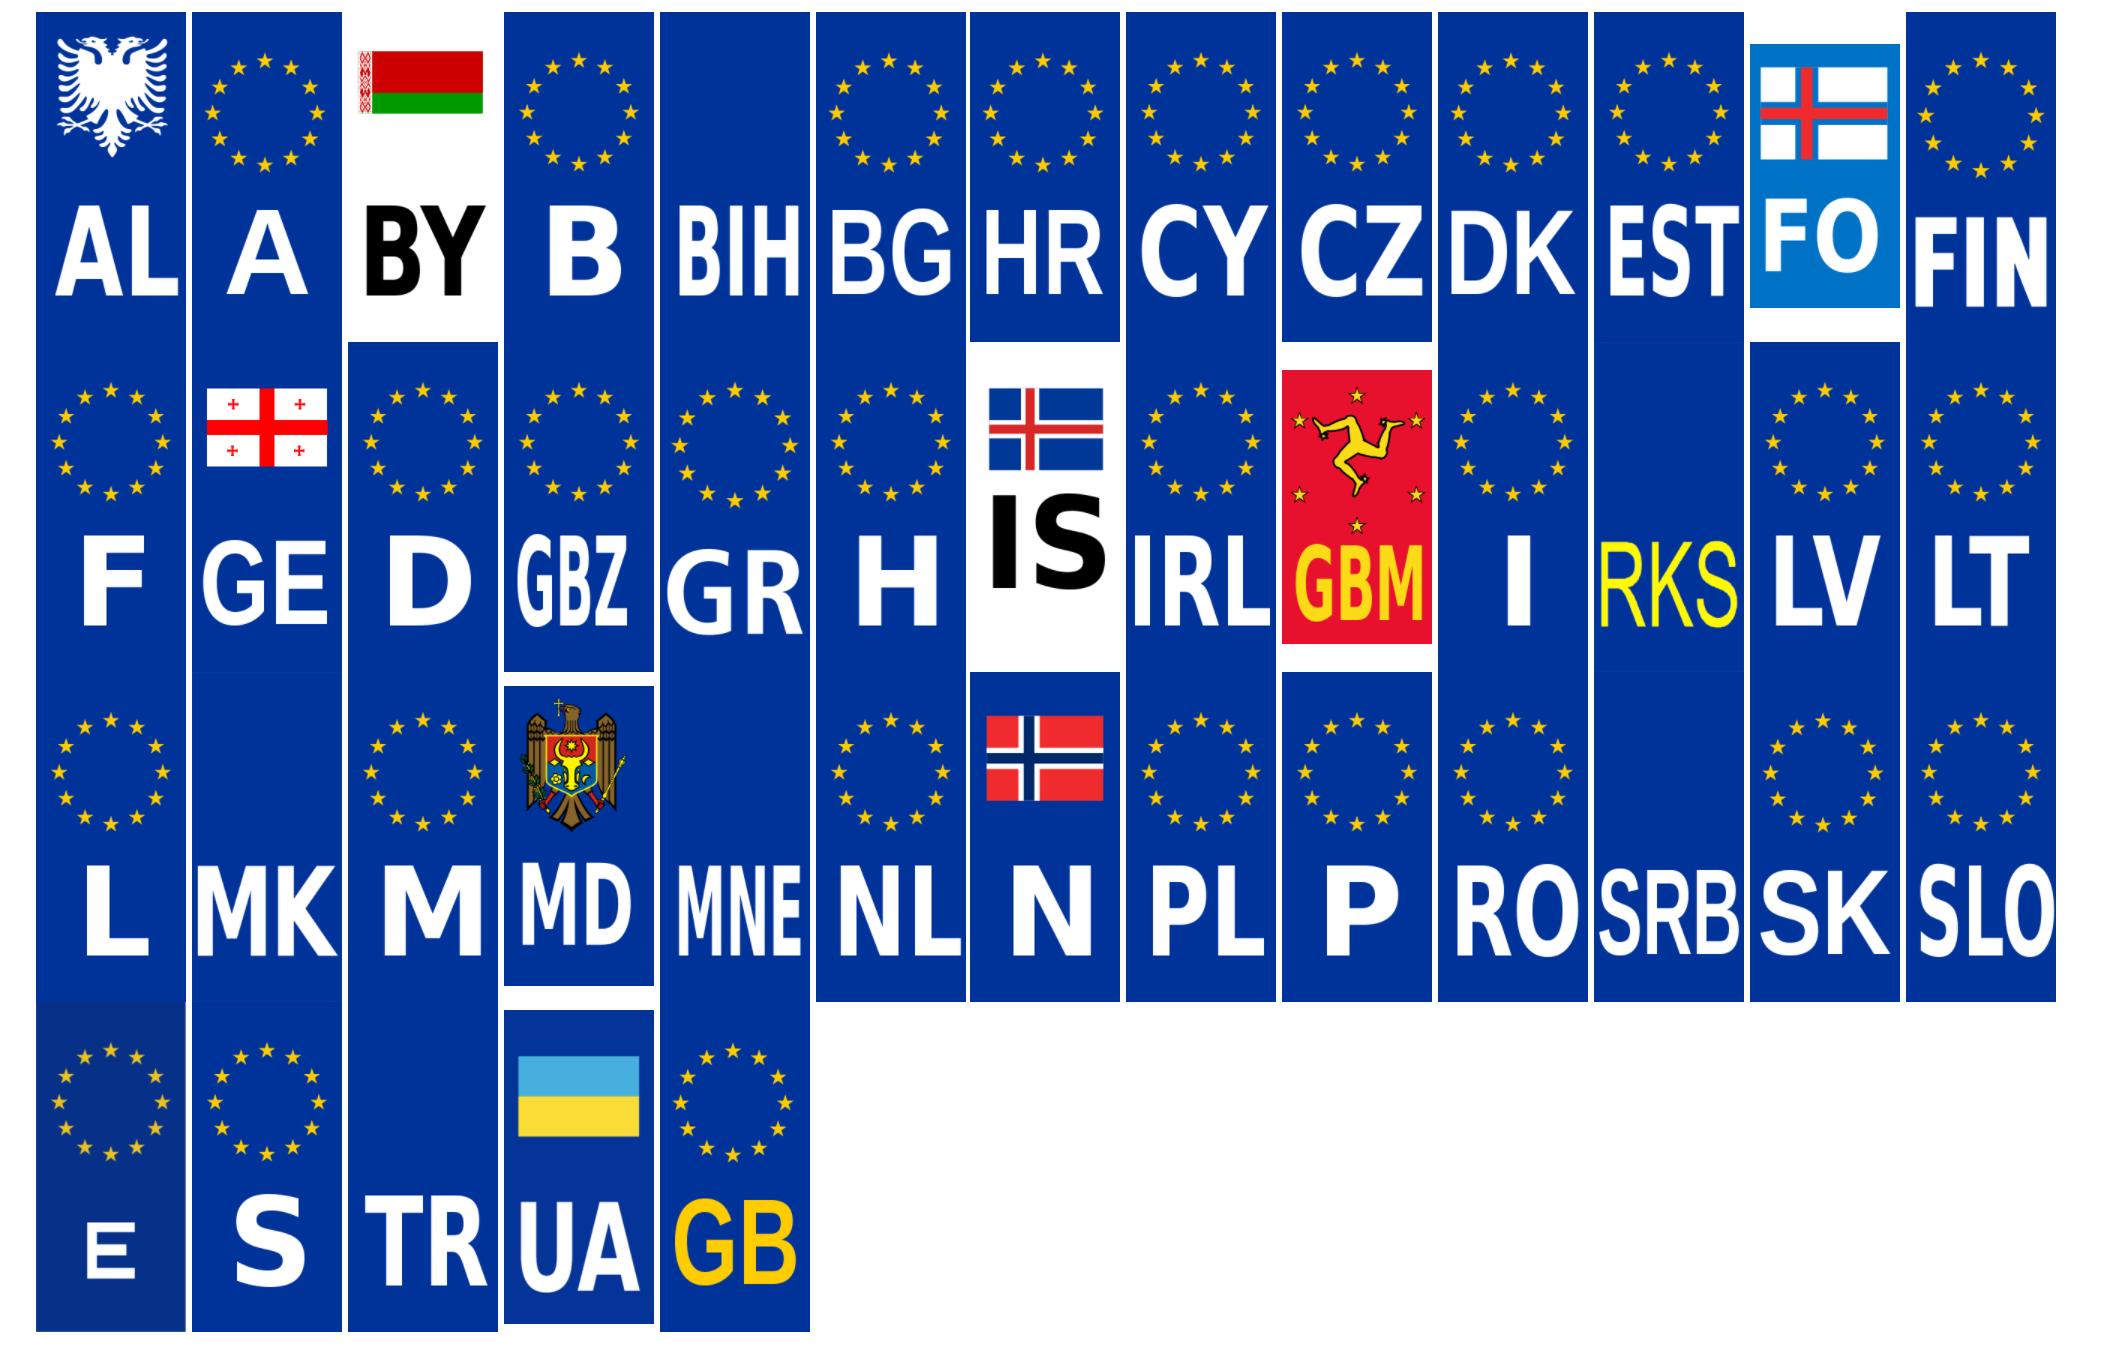 Inmatriculari de autoturisme noi in Uniunea Europeana – Ianuarie 2021